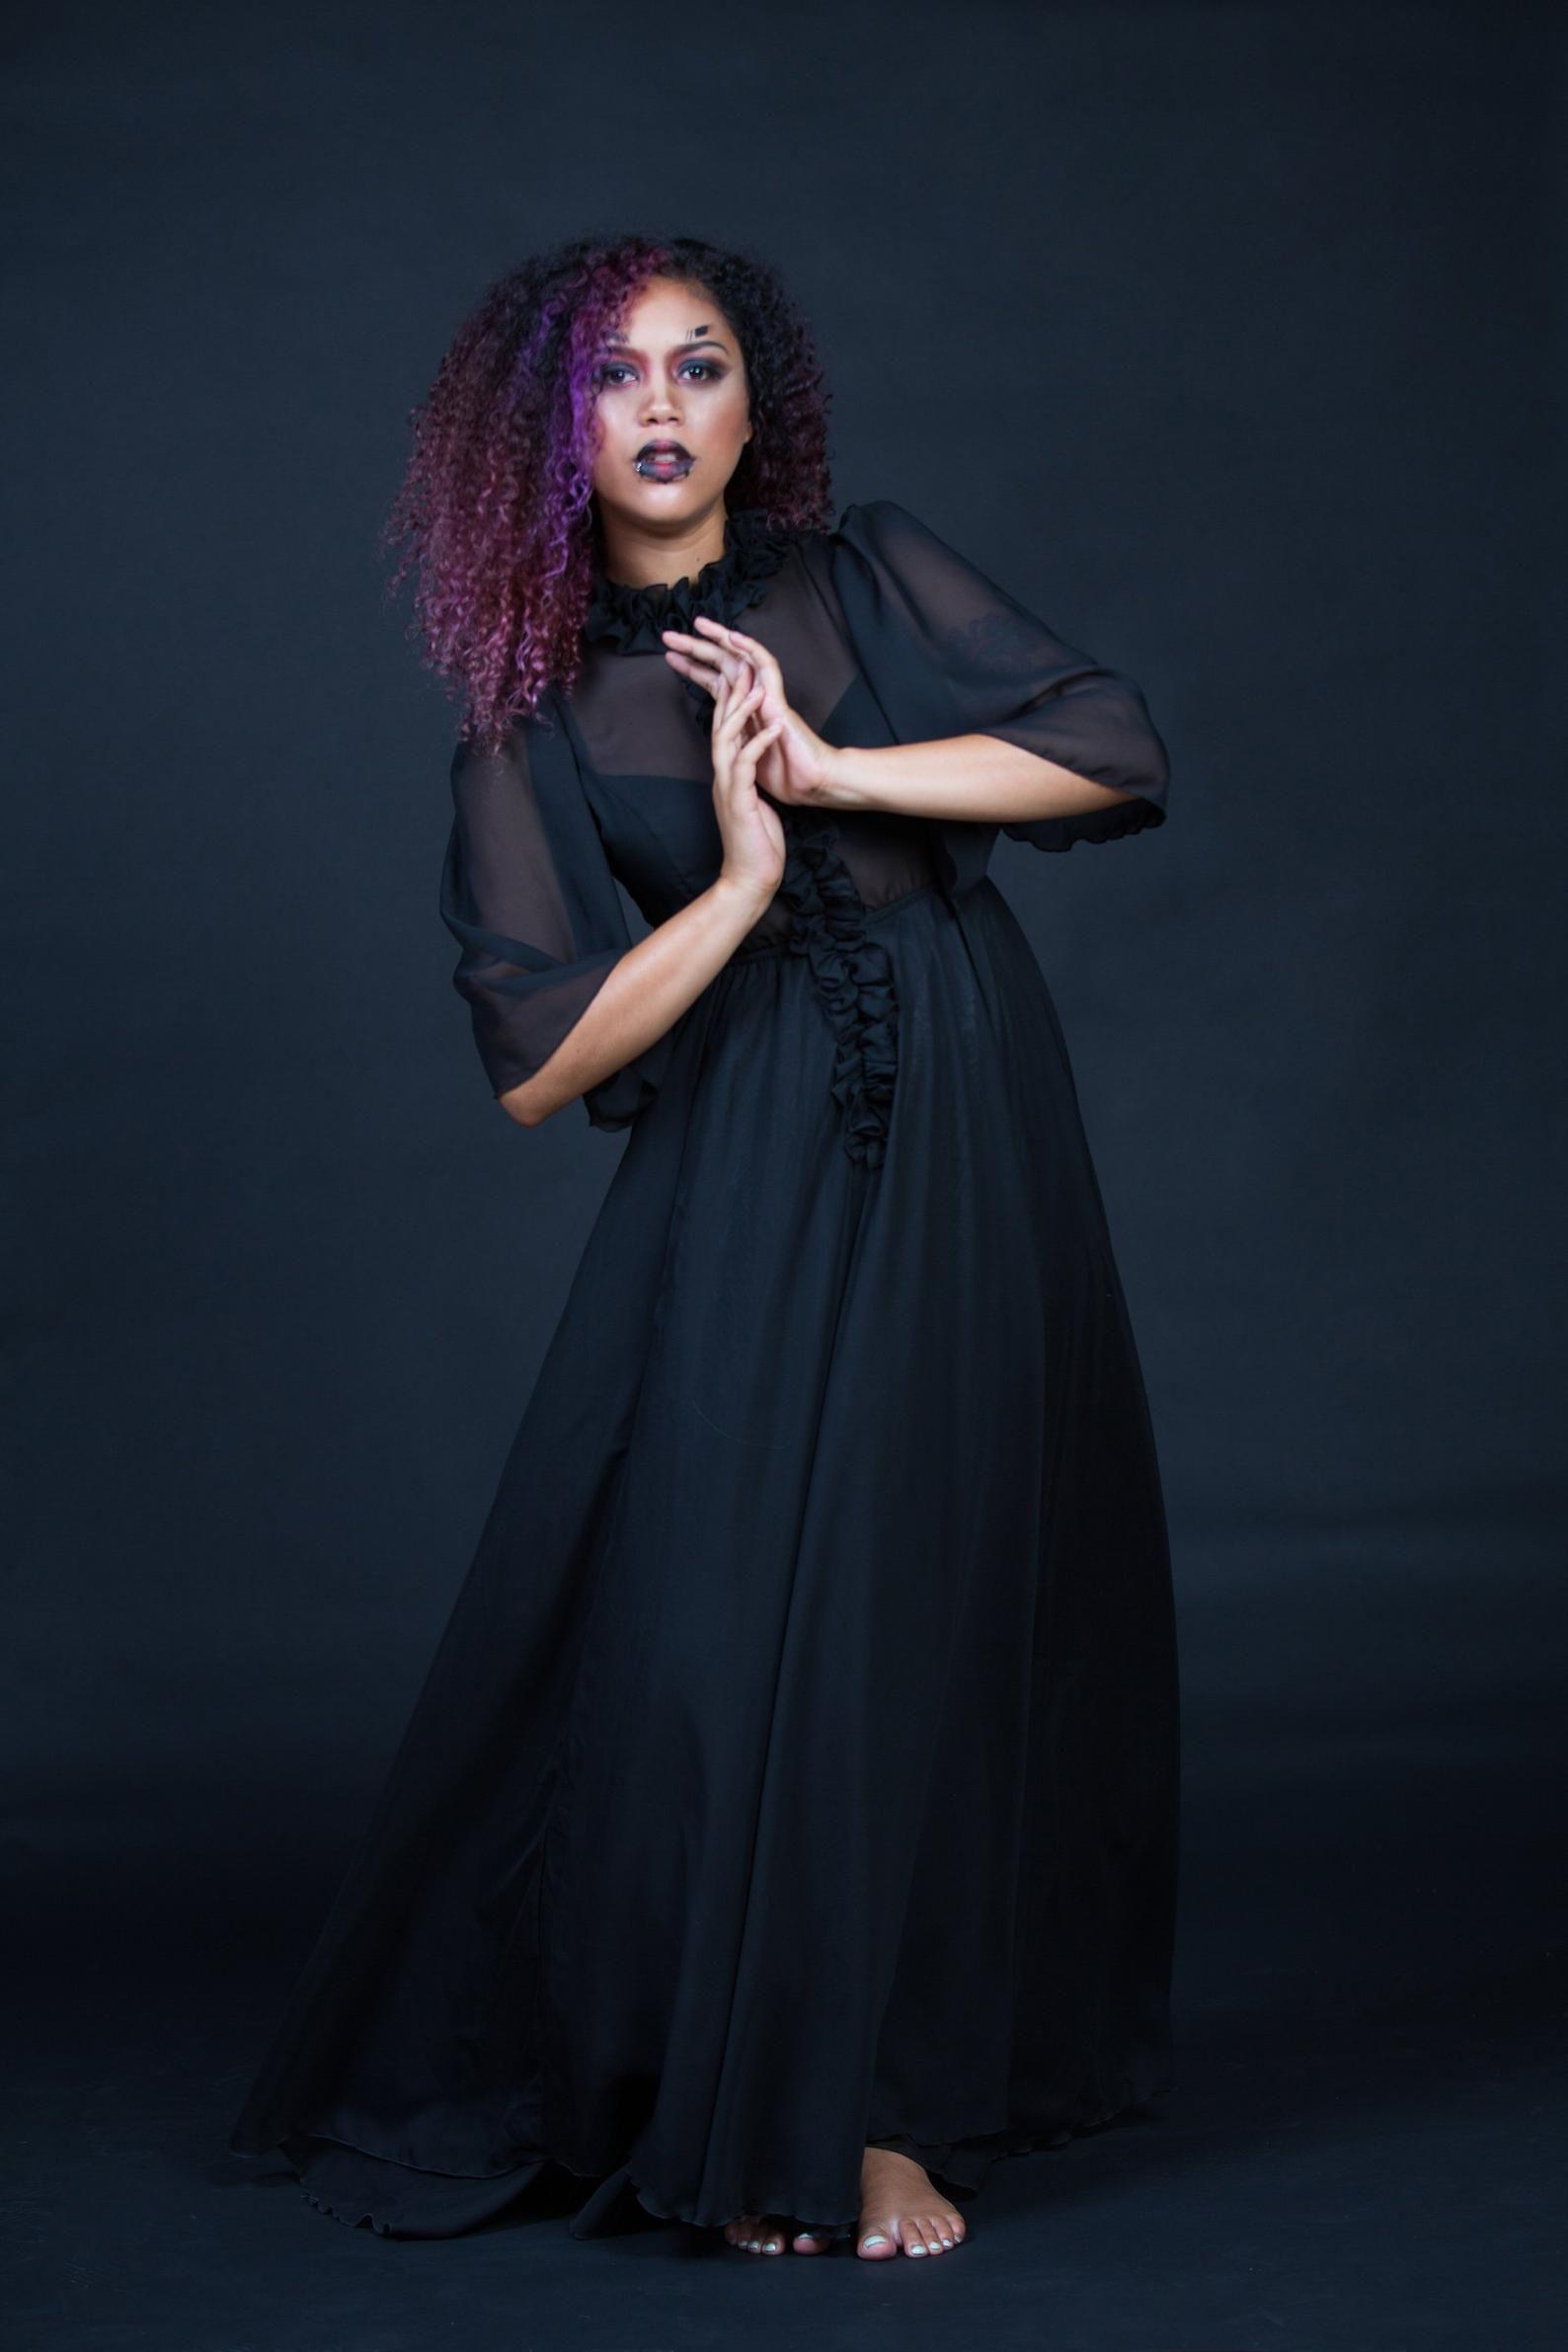 Black chiffon dress witchy clothing witch costume